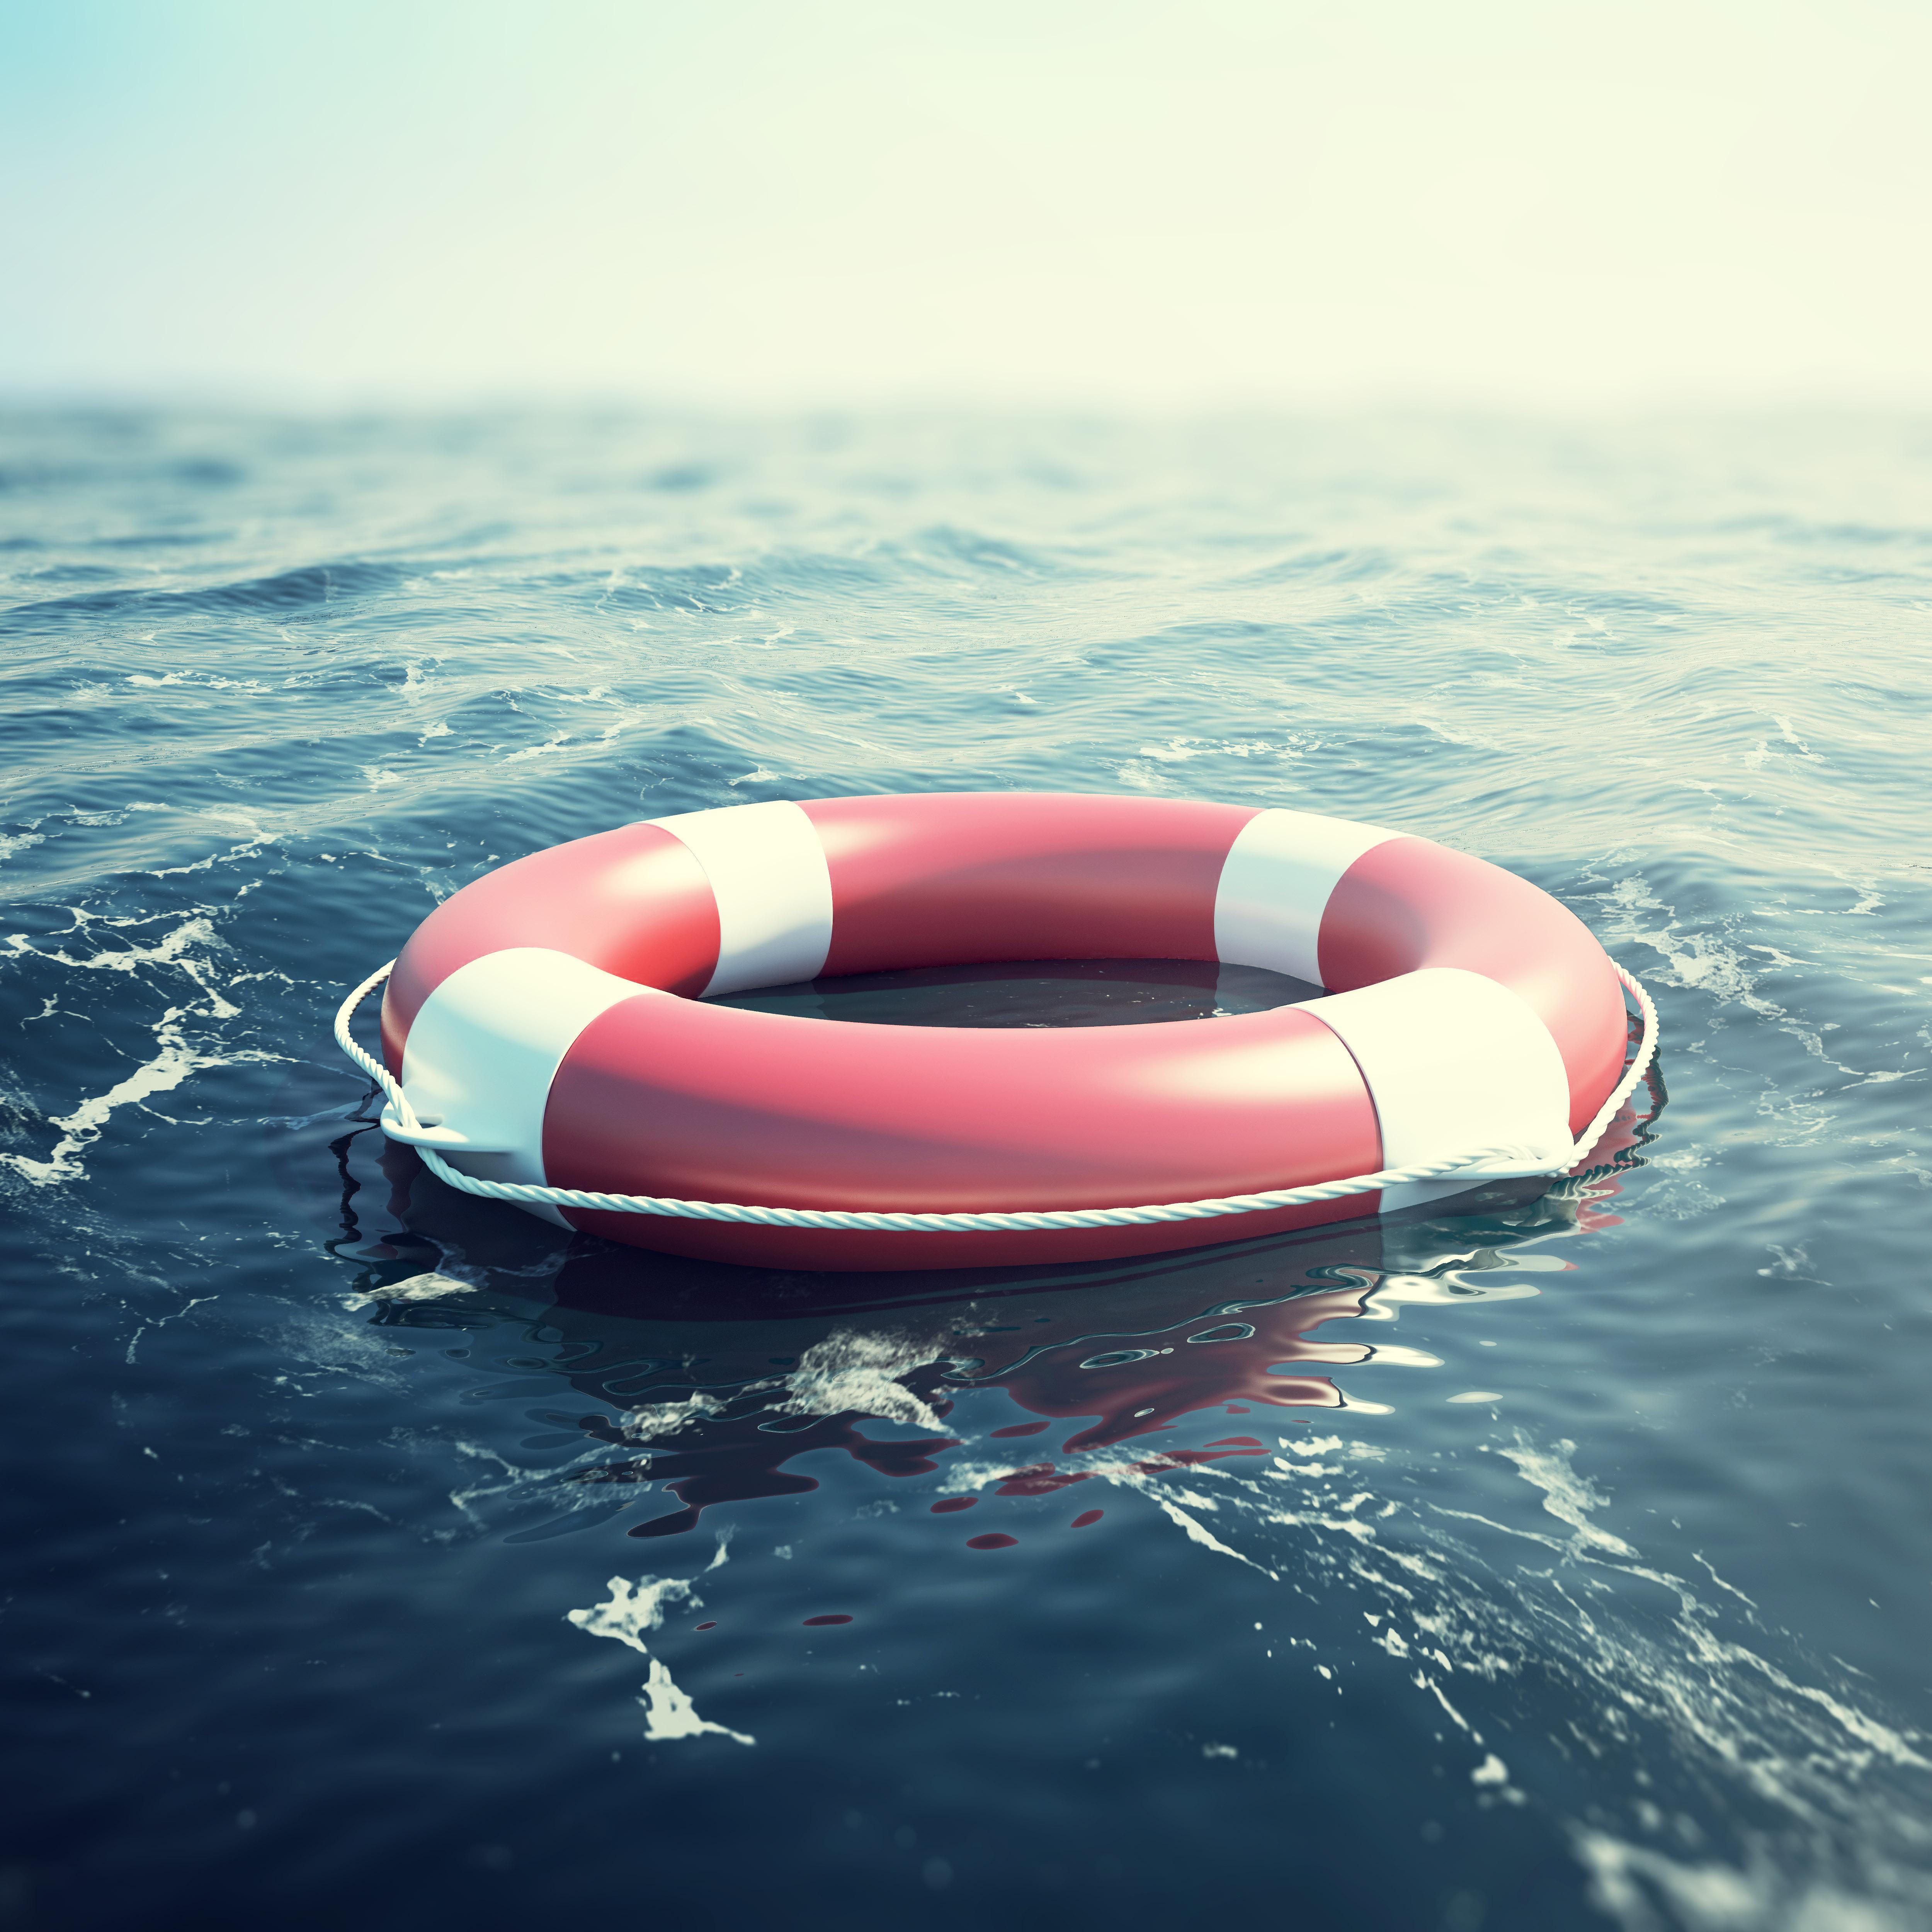 Security Buzzwords: Sink or Swim?